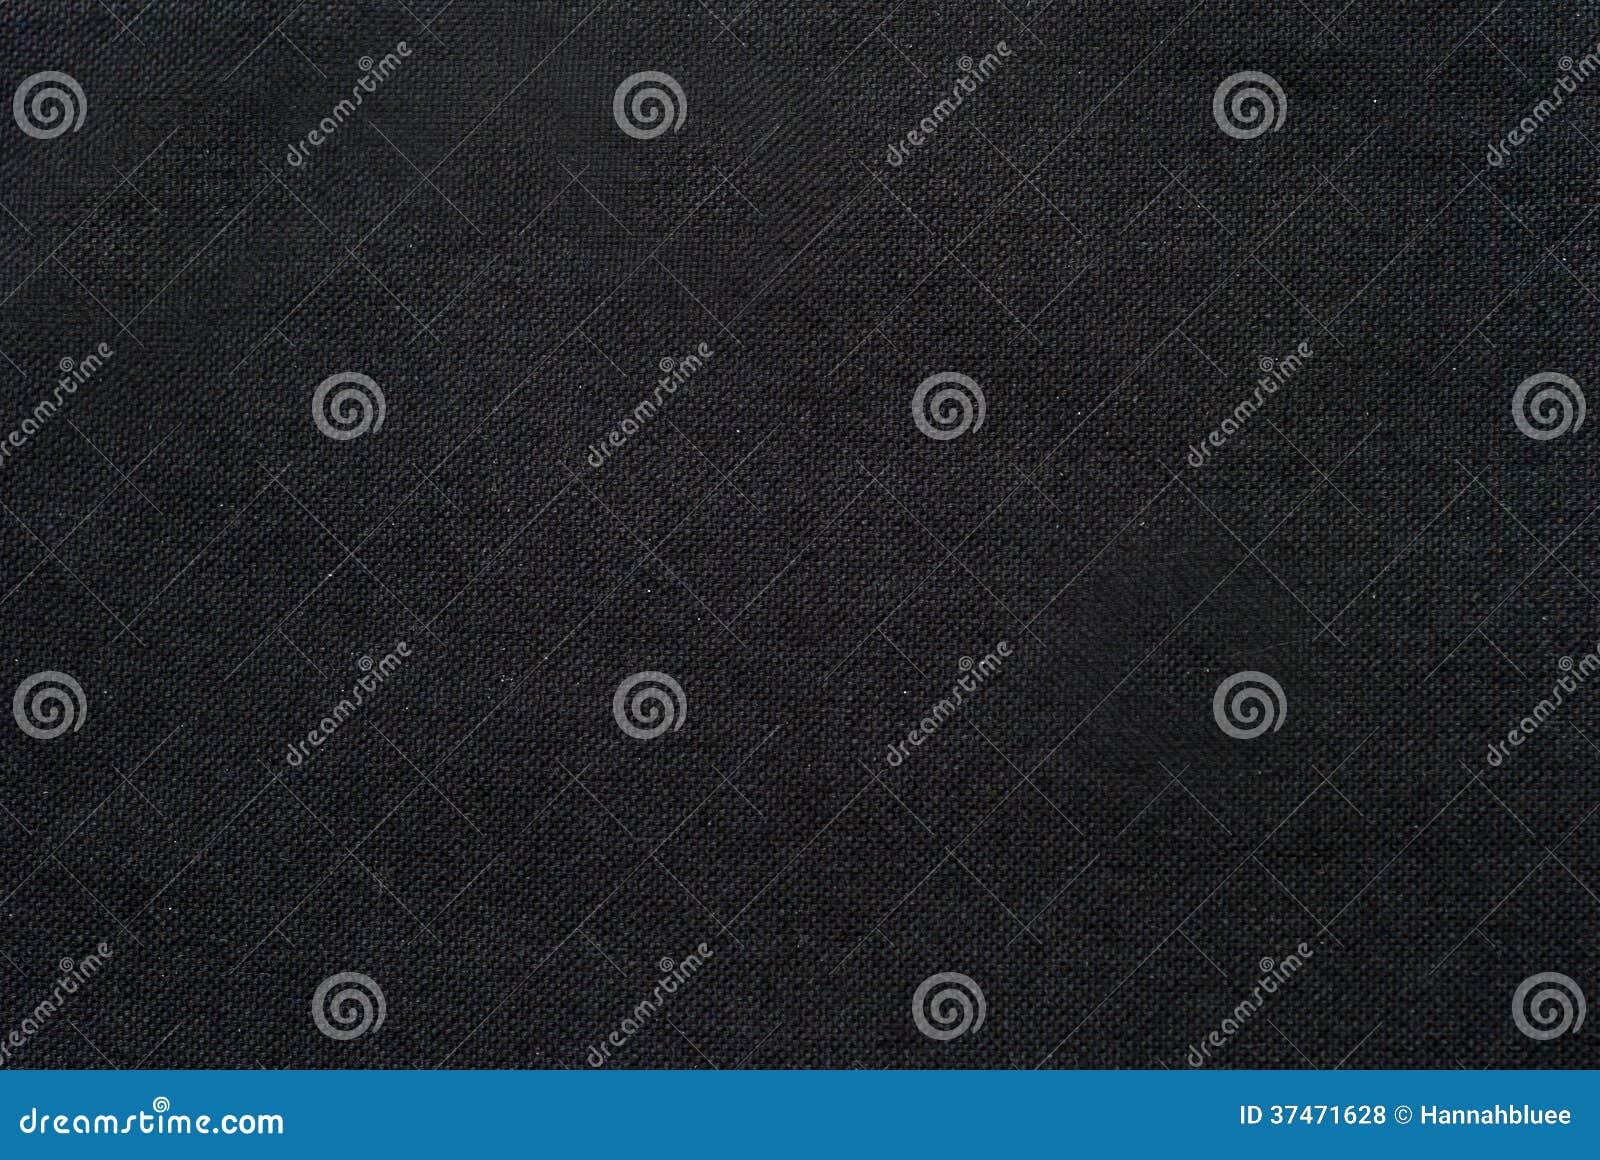 Black Canvas Background : Dark fabric texture detail royalty free stock photos